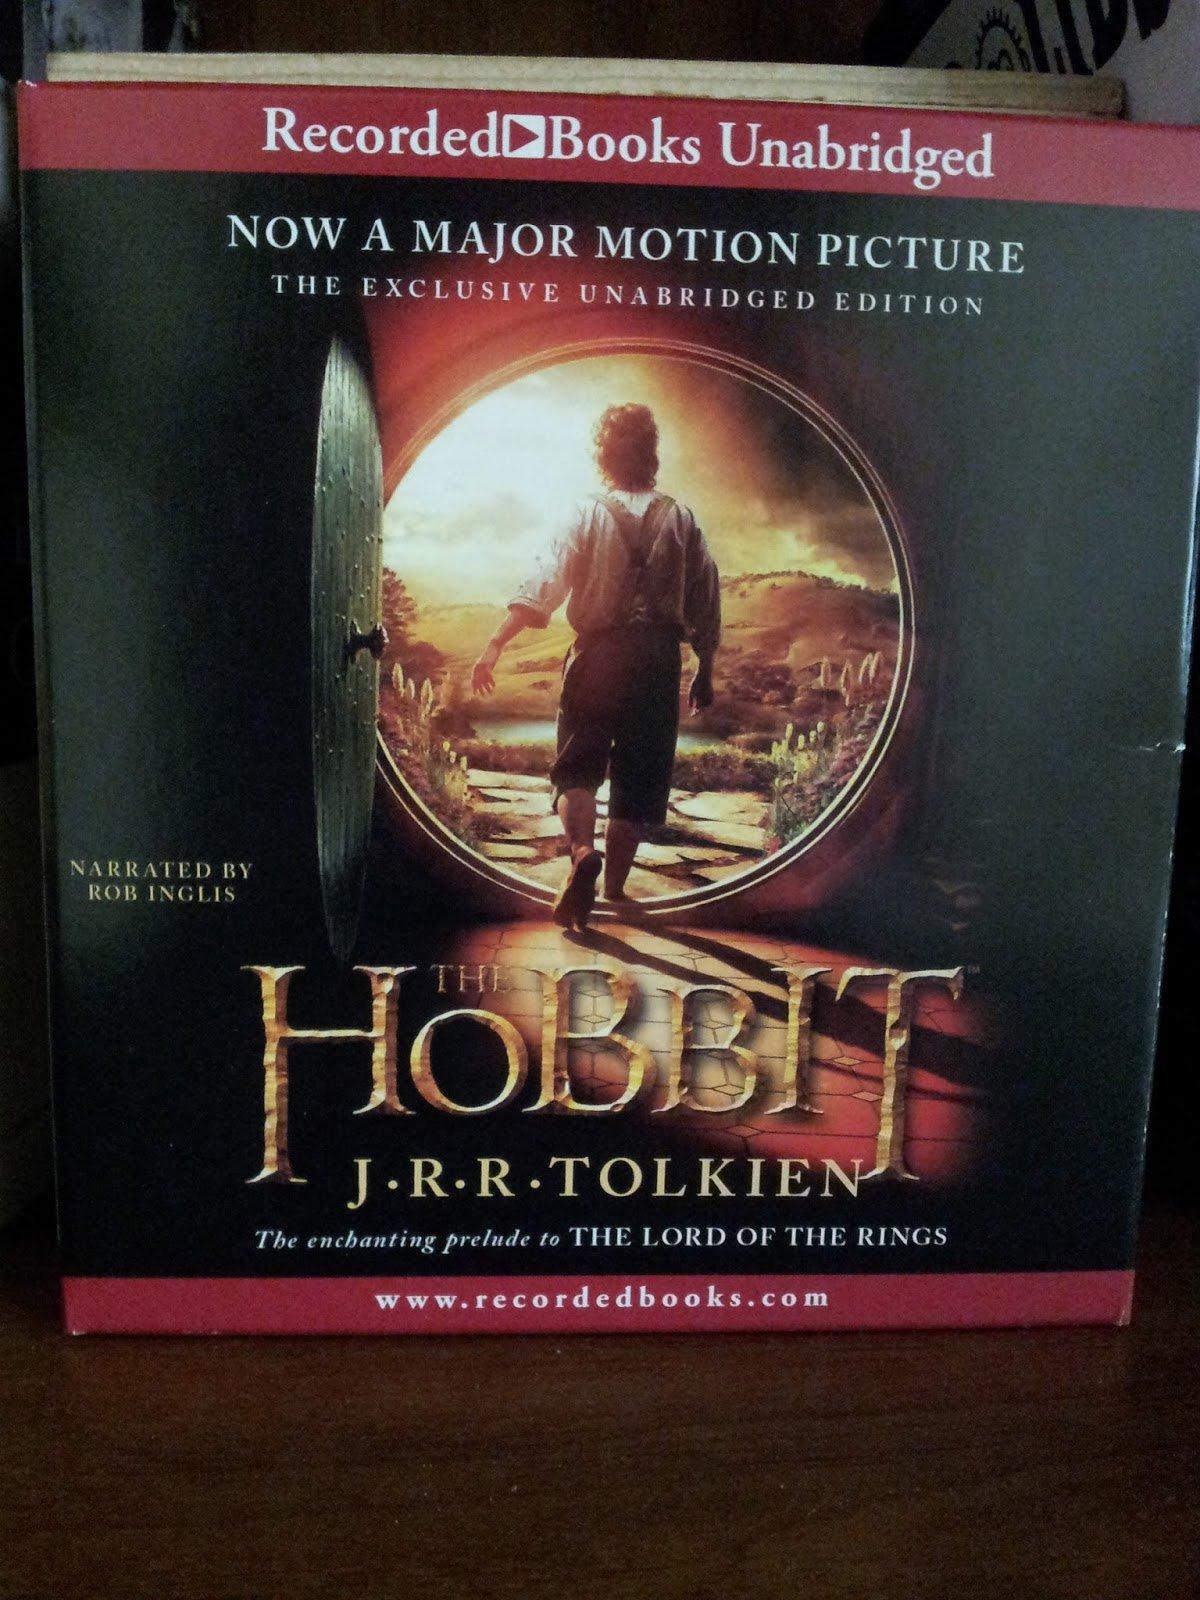 The Hobbit By J.R.R. Tolkien, Rob Inglis A Audiobook: Amazon.es: -Author-: Libros